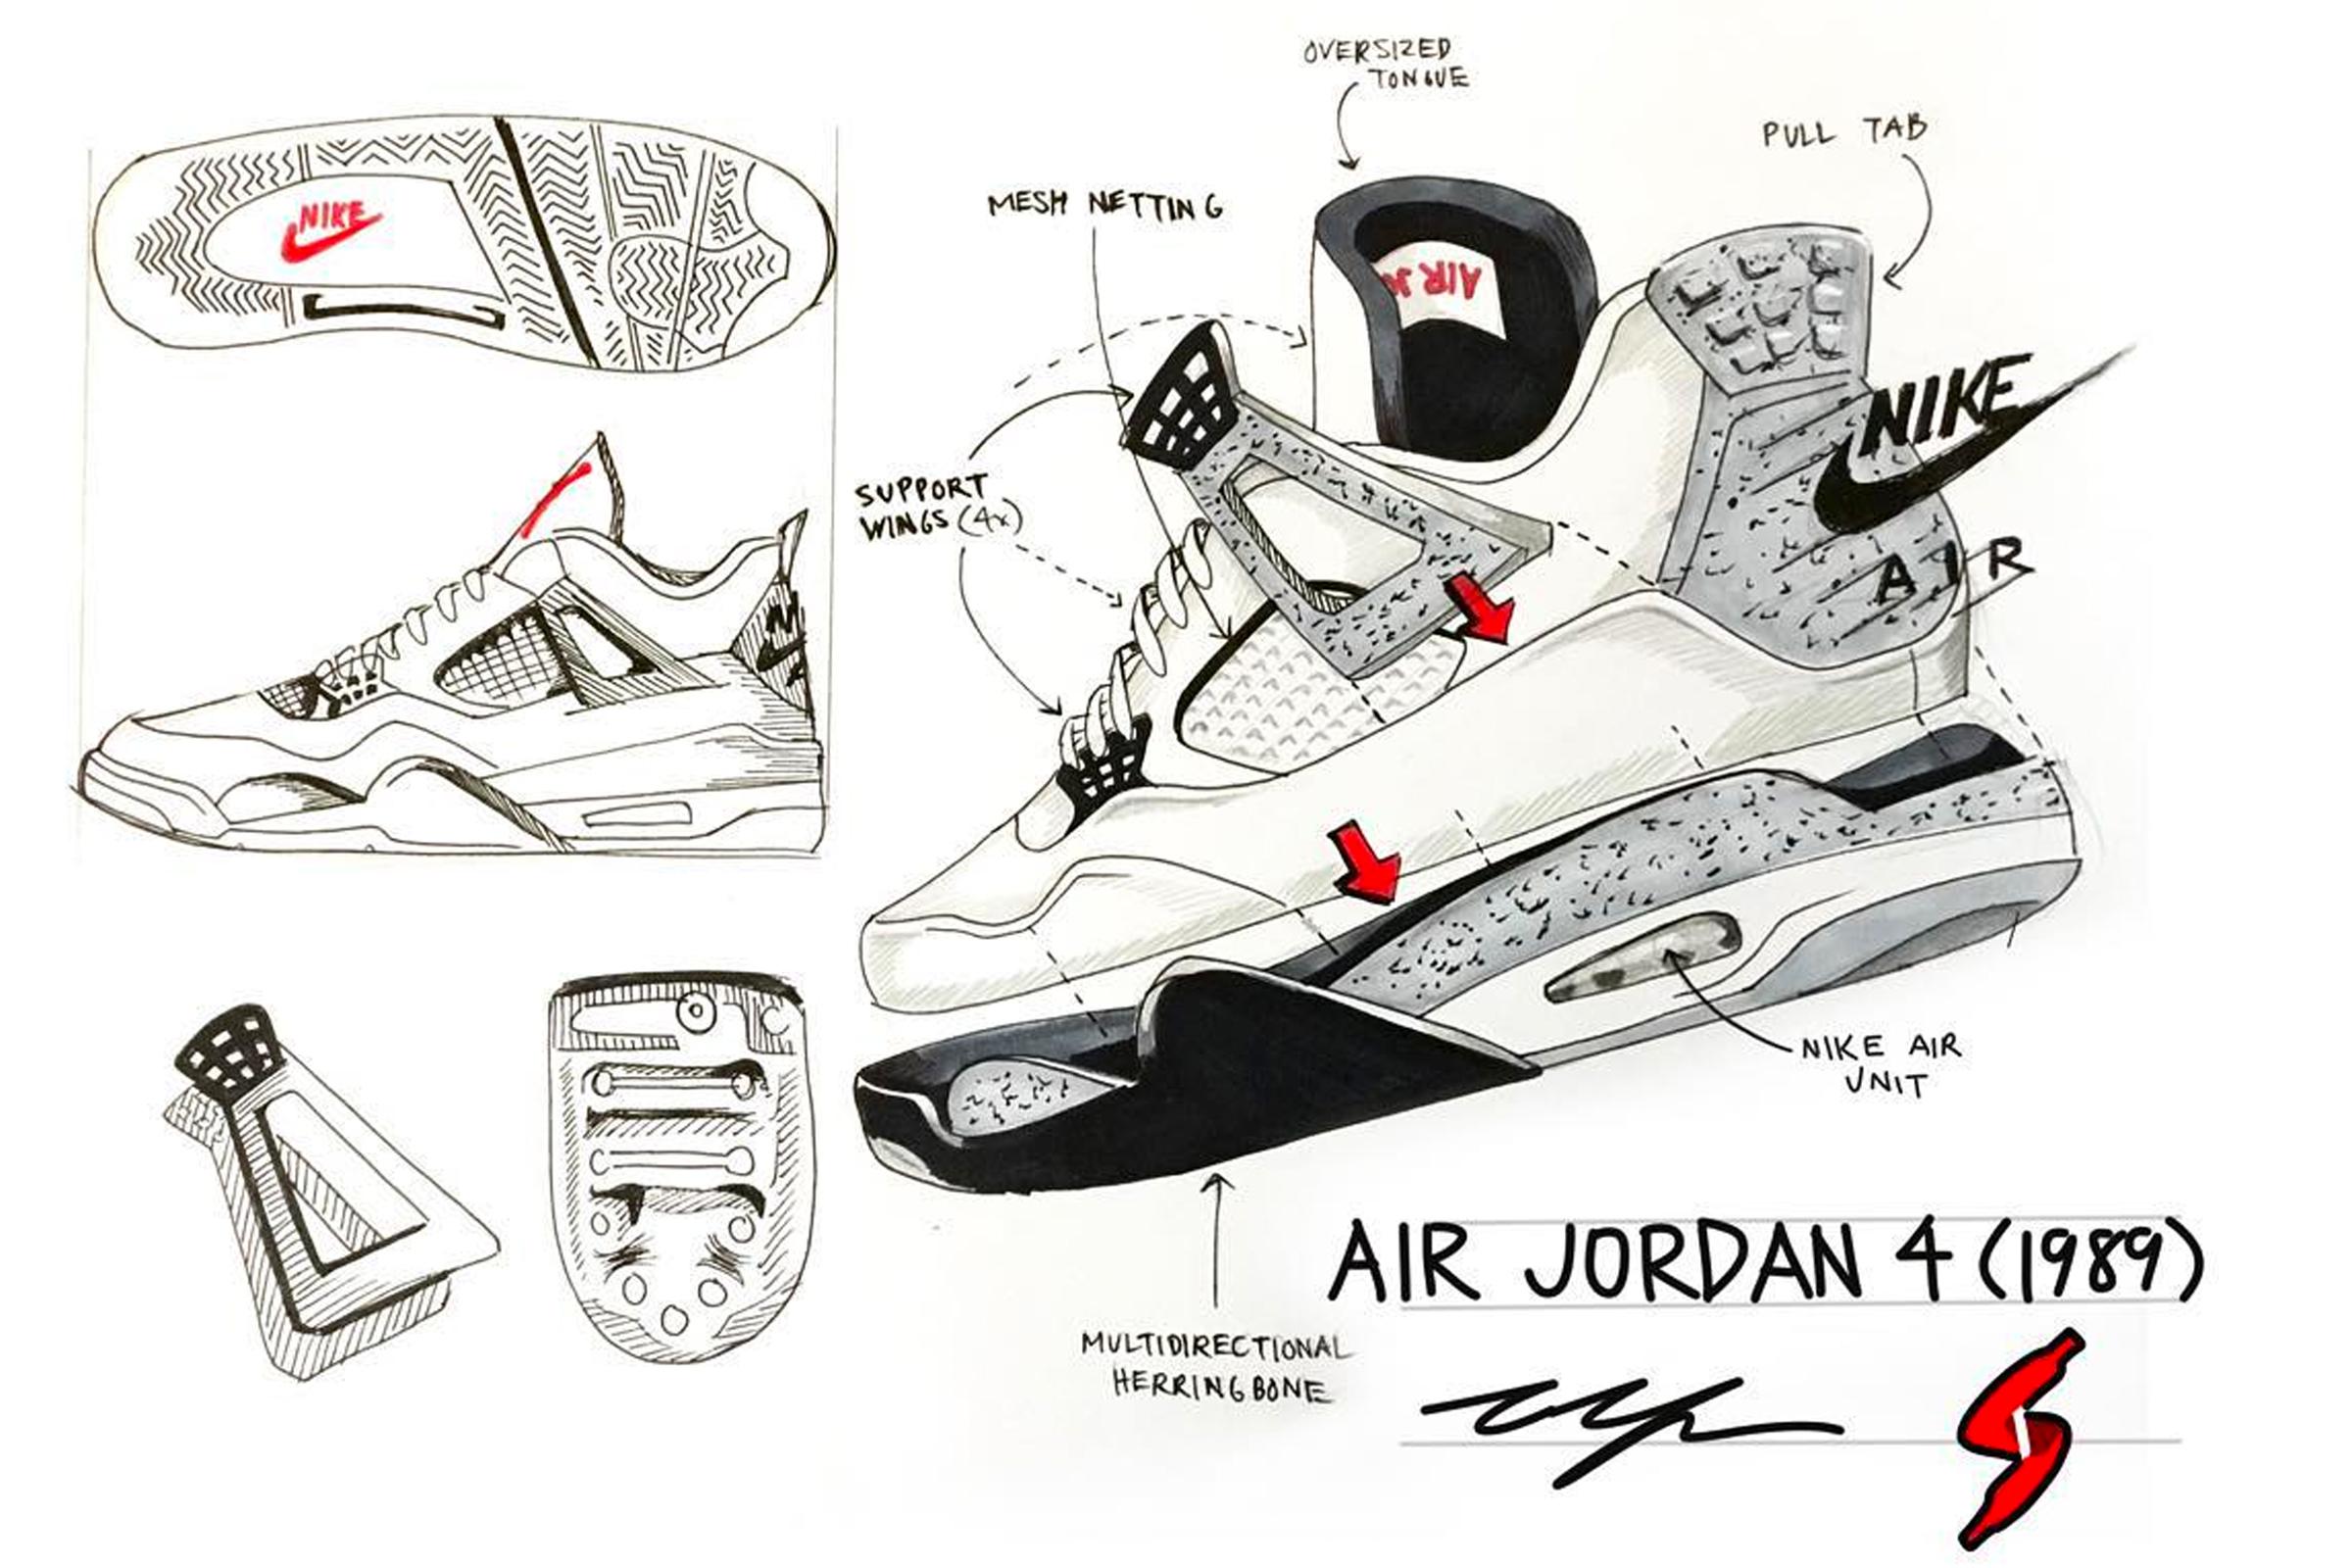 8c3f13dedcb3fd Buggin  Out  Iconic Air Jordan IV Releases - Best Air Jordan 4 Releases